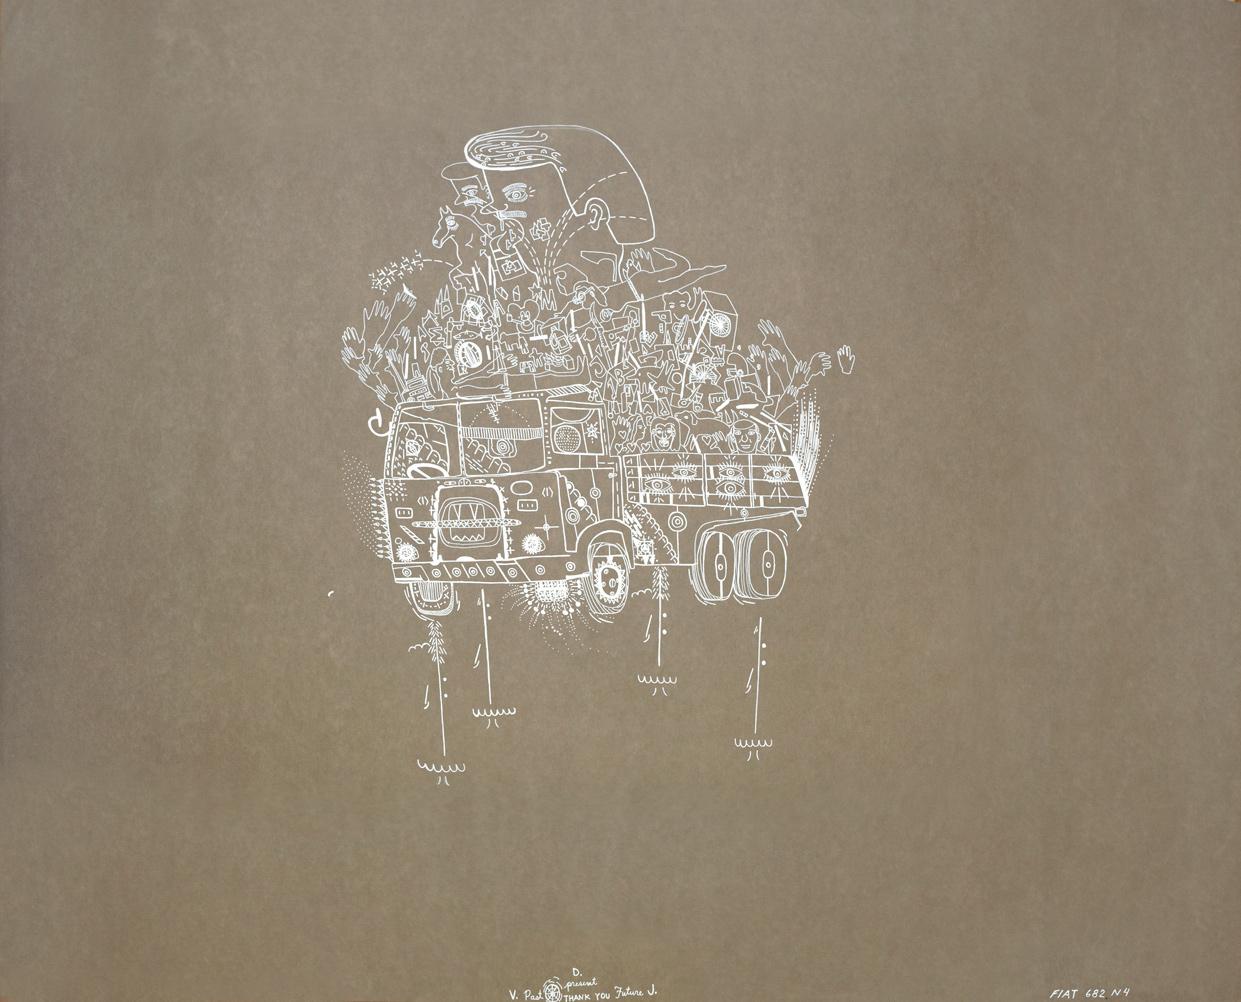 "Veronica de Jesus  FIAT , 2013 White pen on paper 33"" x 41"" Retail Value: $3,000 Opening Bid: $1,500"